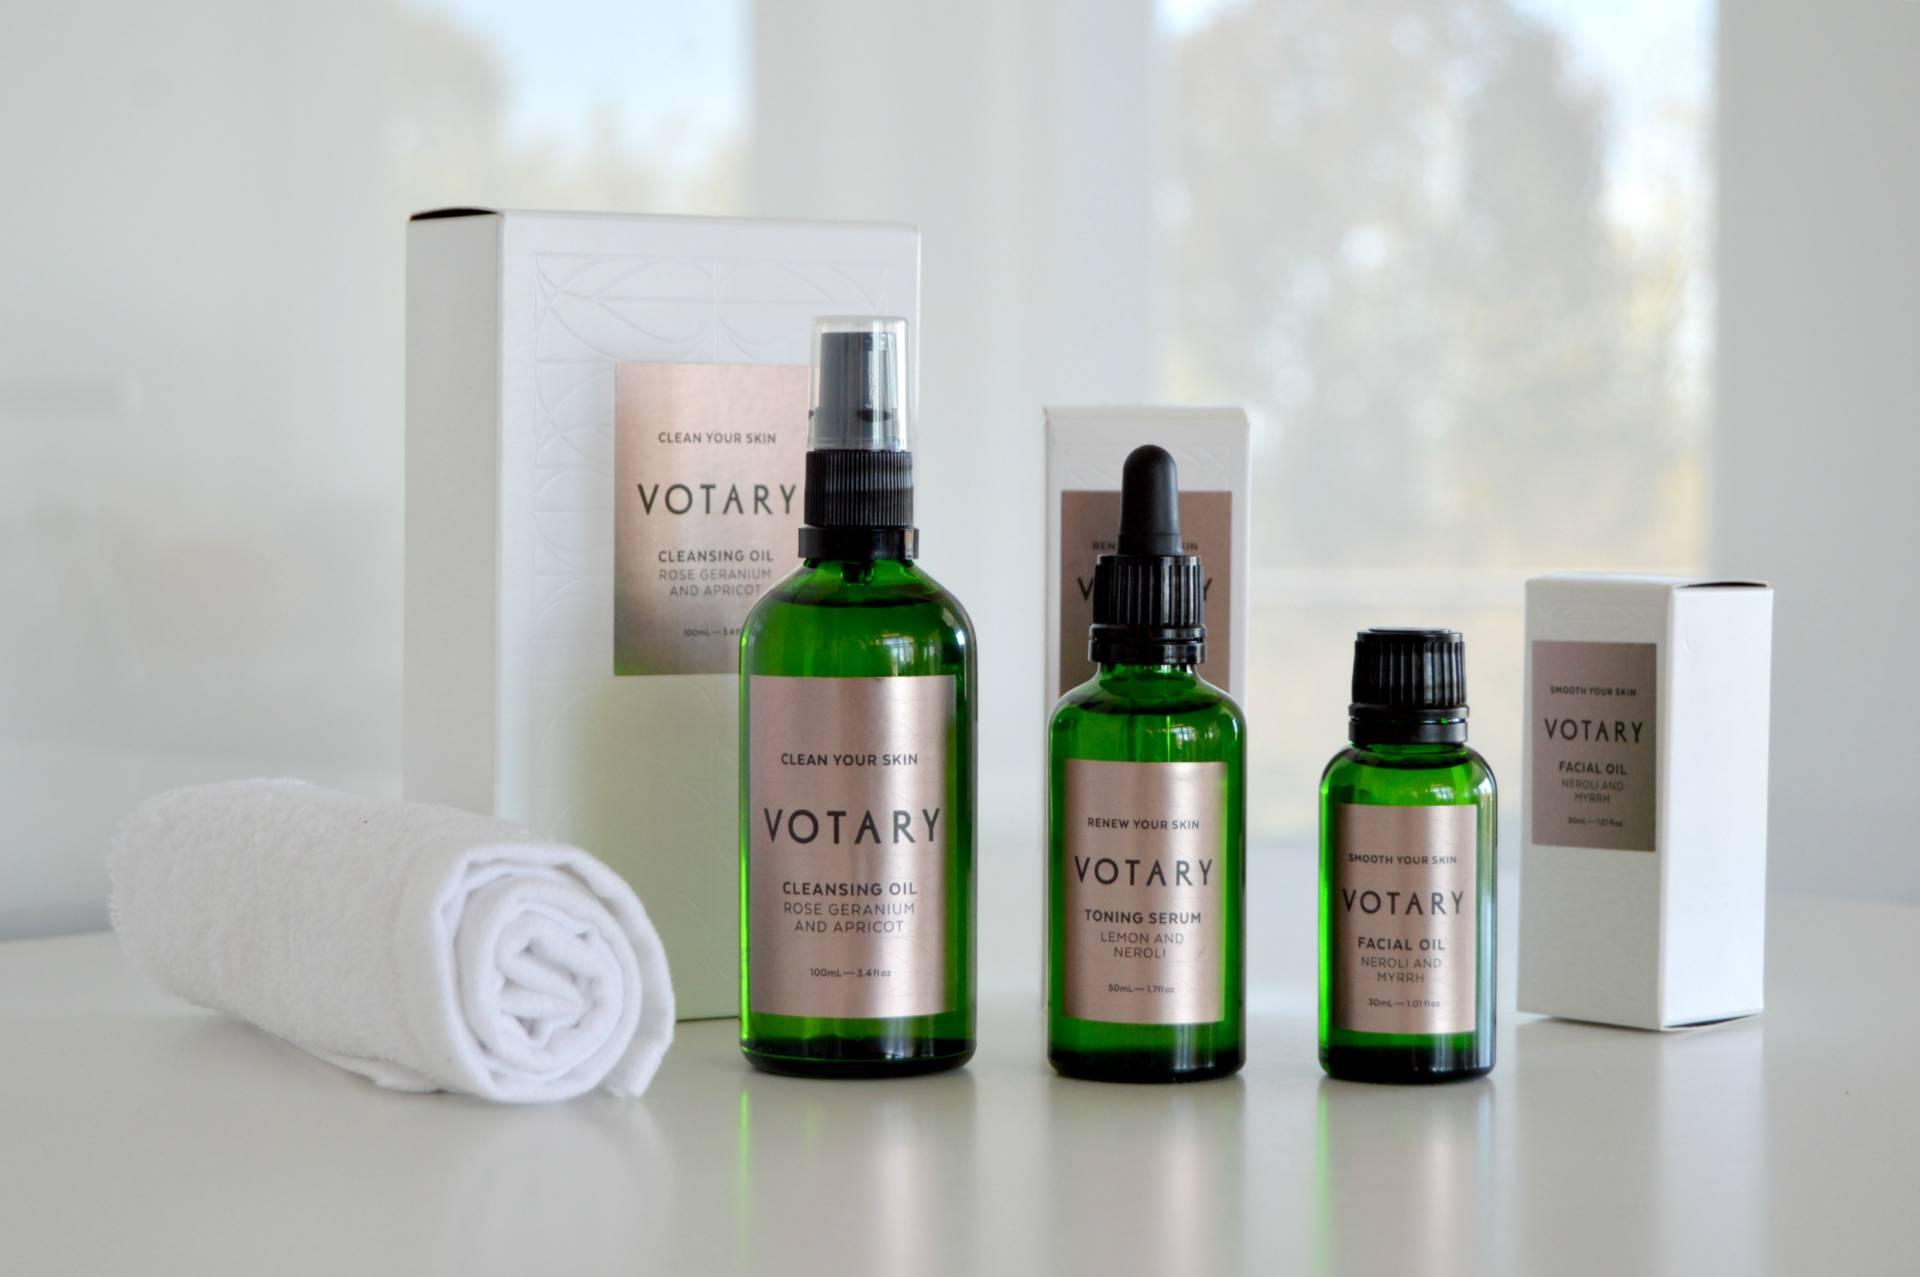 votary-london-skincare-review-inhautepursuit-liberty-shopping-travel